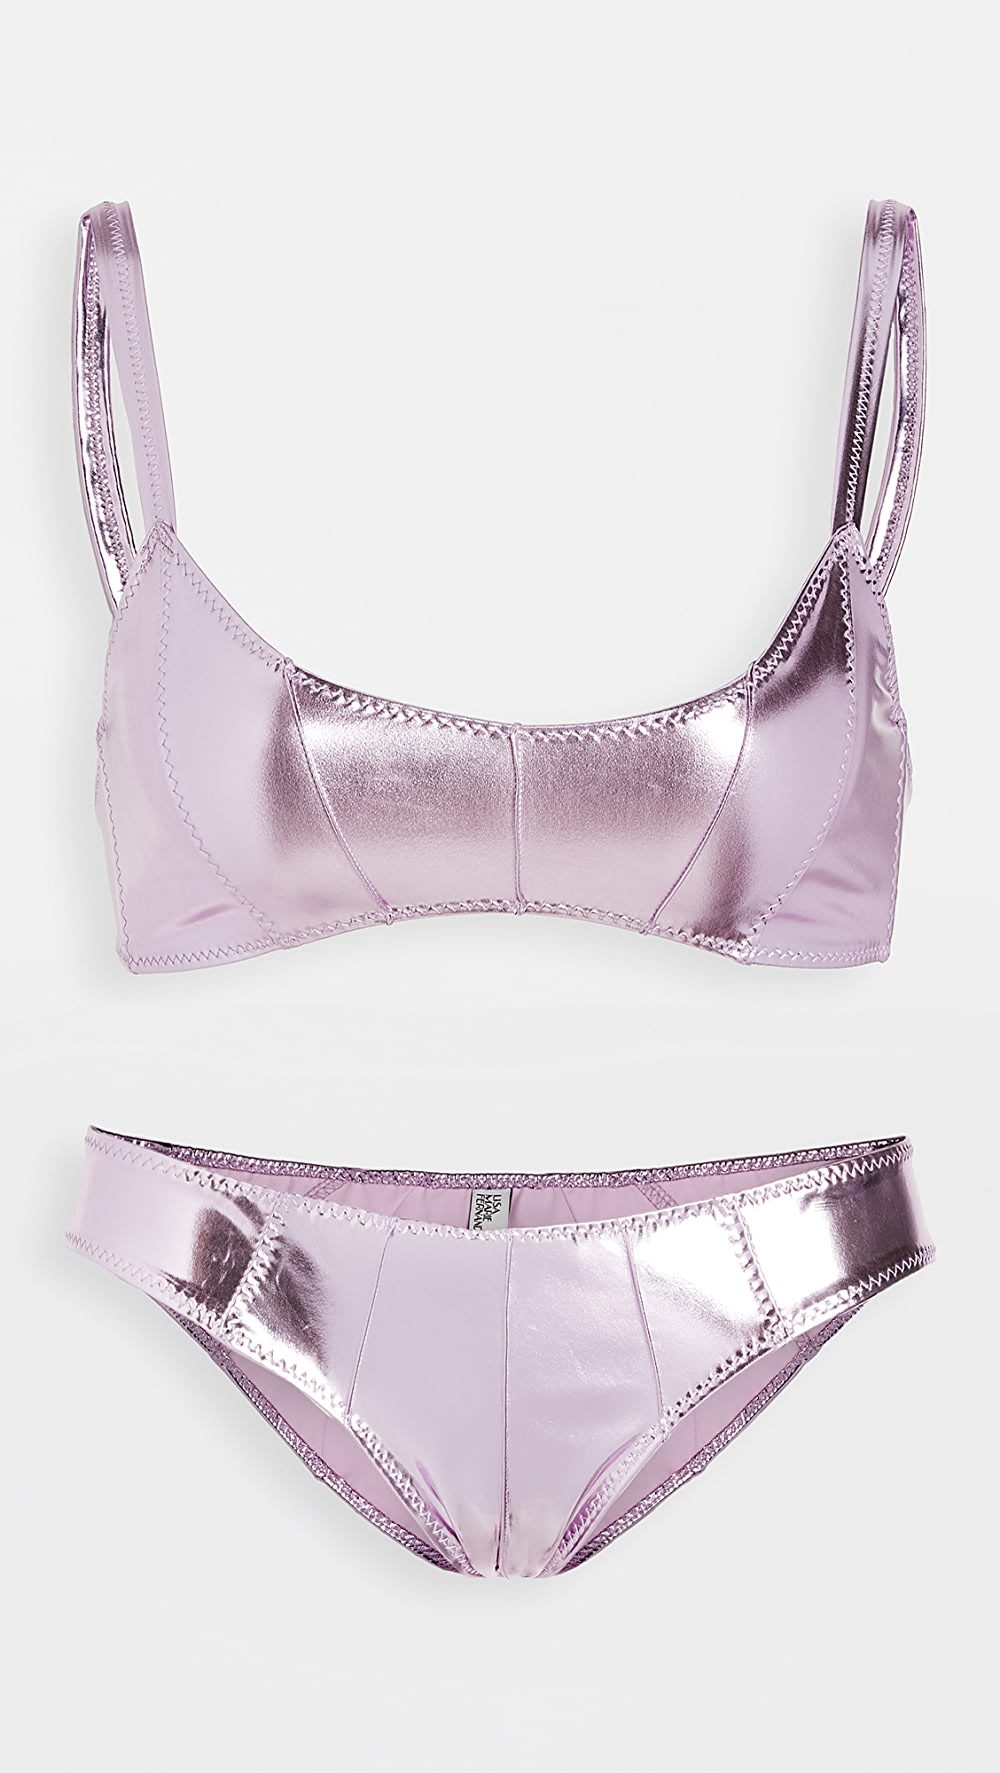 2019 Fashion Lisa Marie Fernandez - Genevieve Pintuck Bikini Set Sale Price